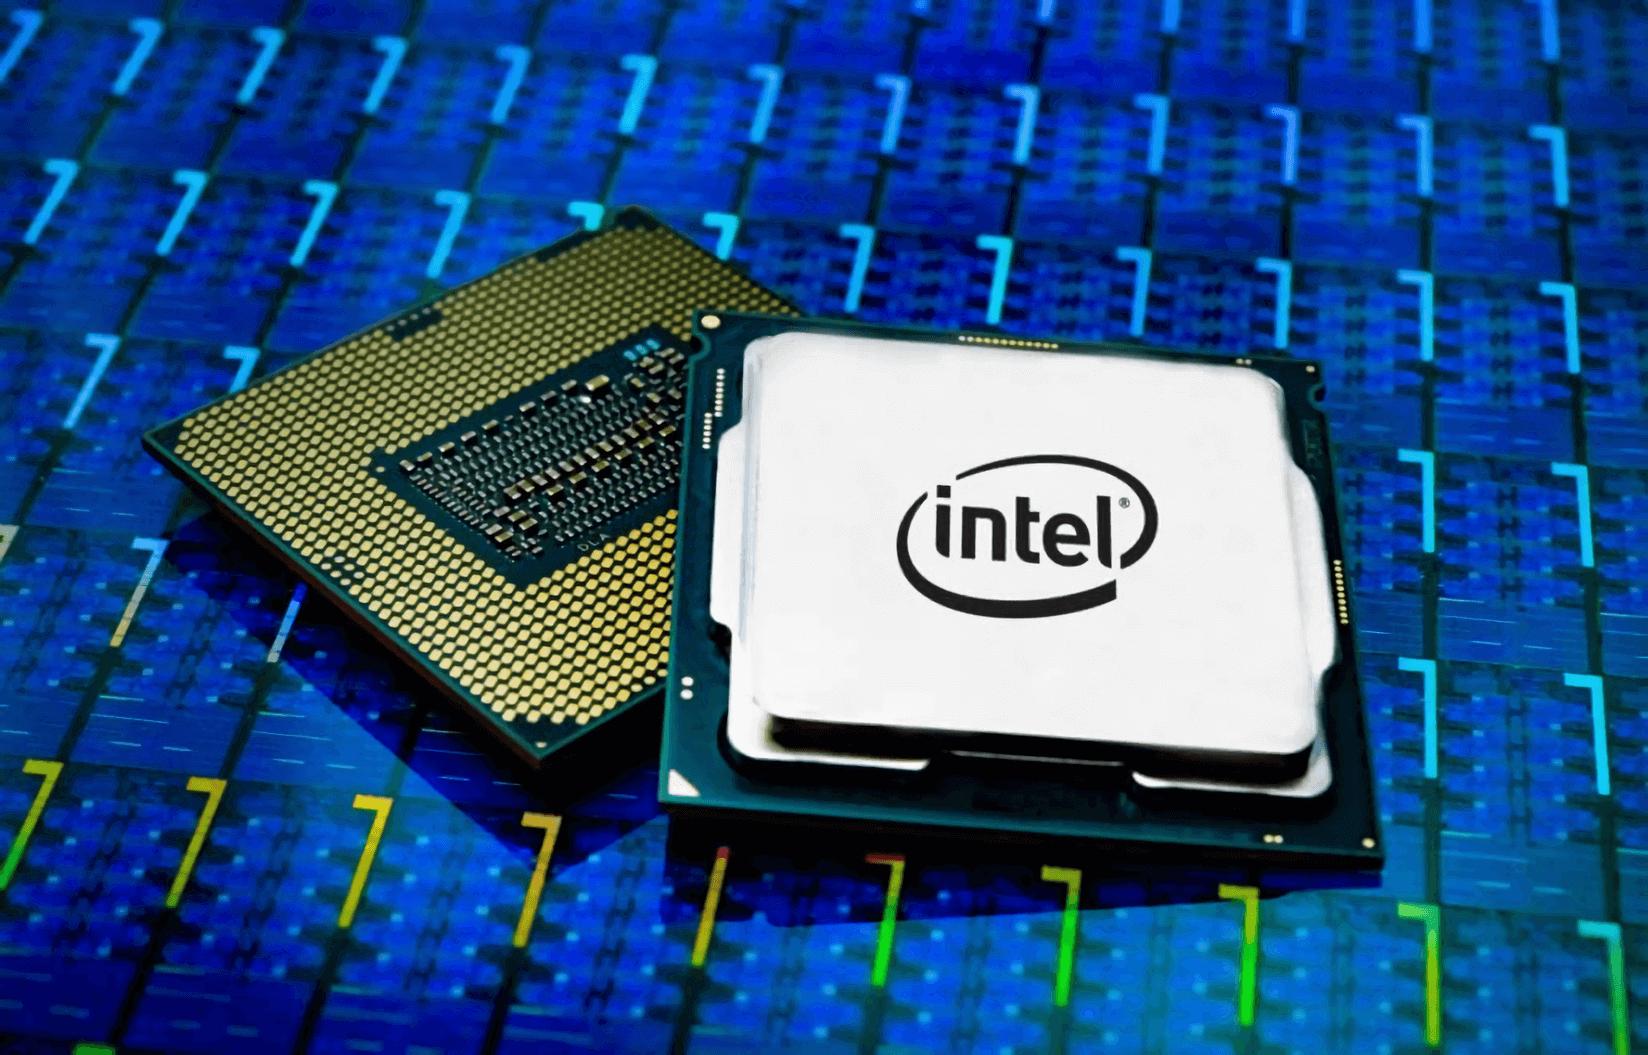 Intel Tiger Lake Y processor posts absurd UserBenchmark